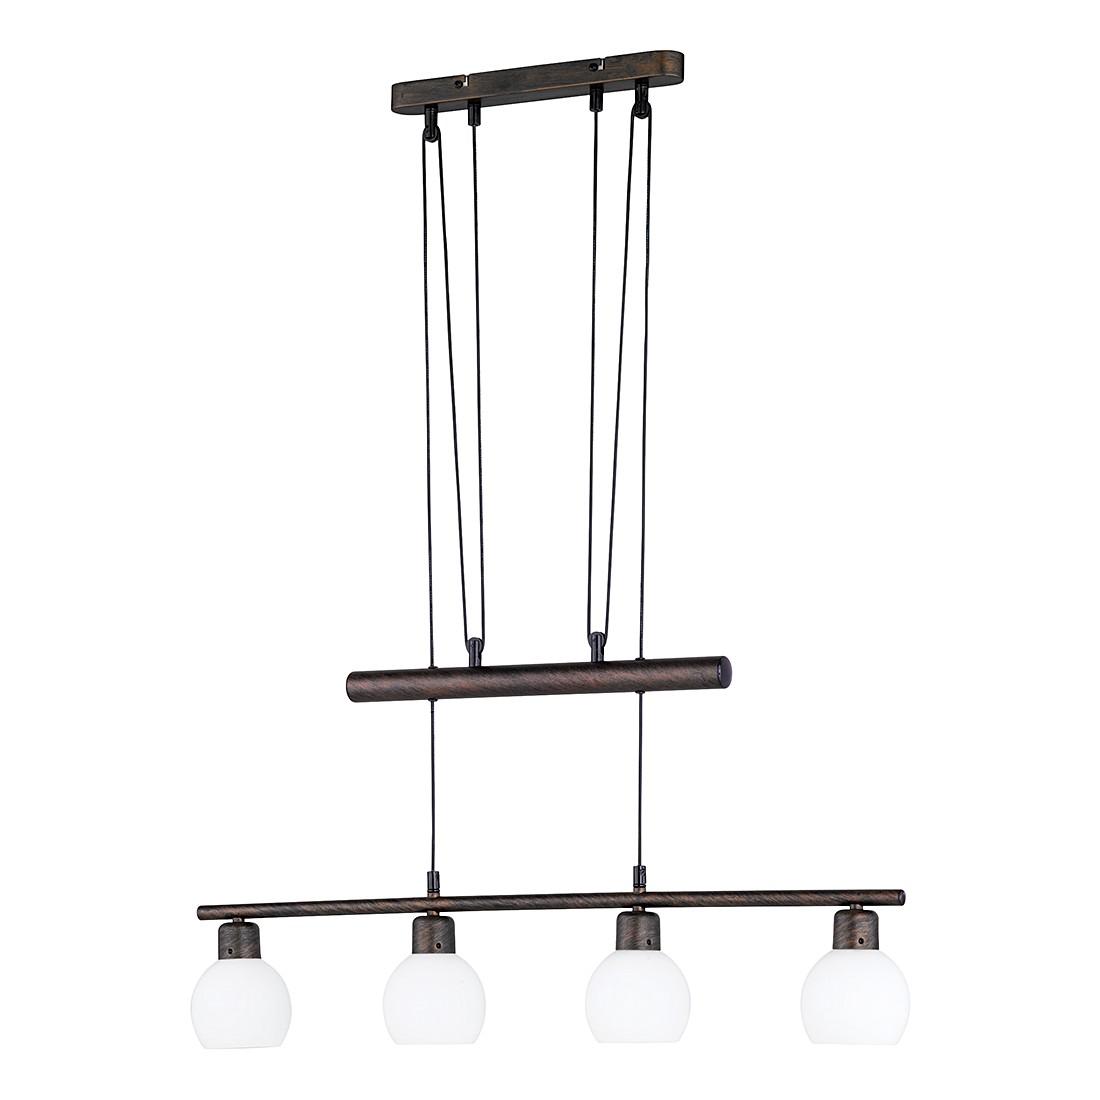 LED-JoJo-Pendelleuchte ● Rost Antik ● 4x4 W- Lux A++